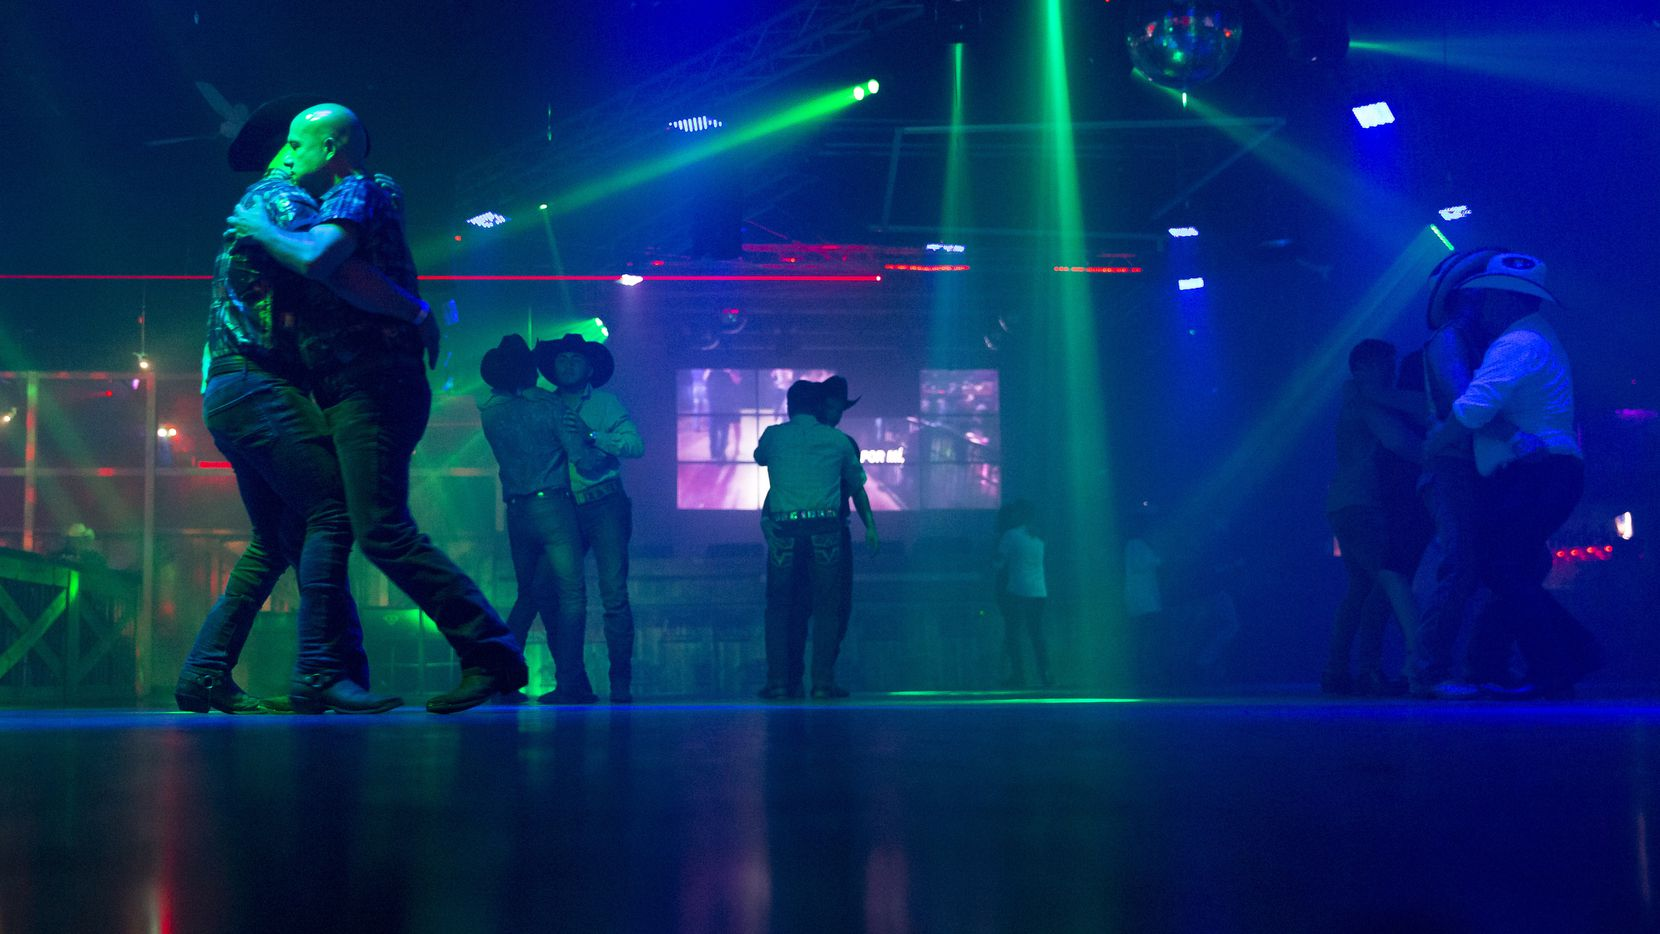 In mid-June, dancers take the floor at Club Los Rieles in Dallas.